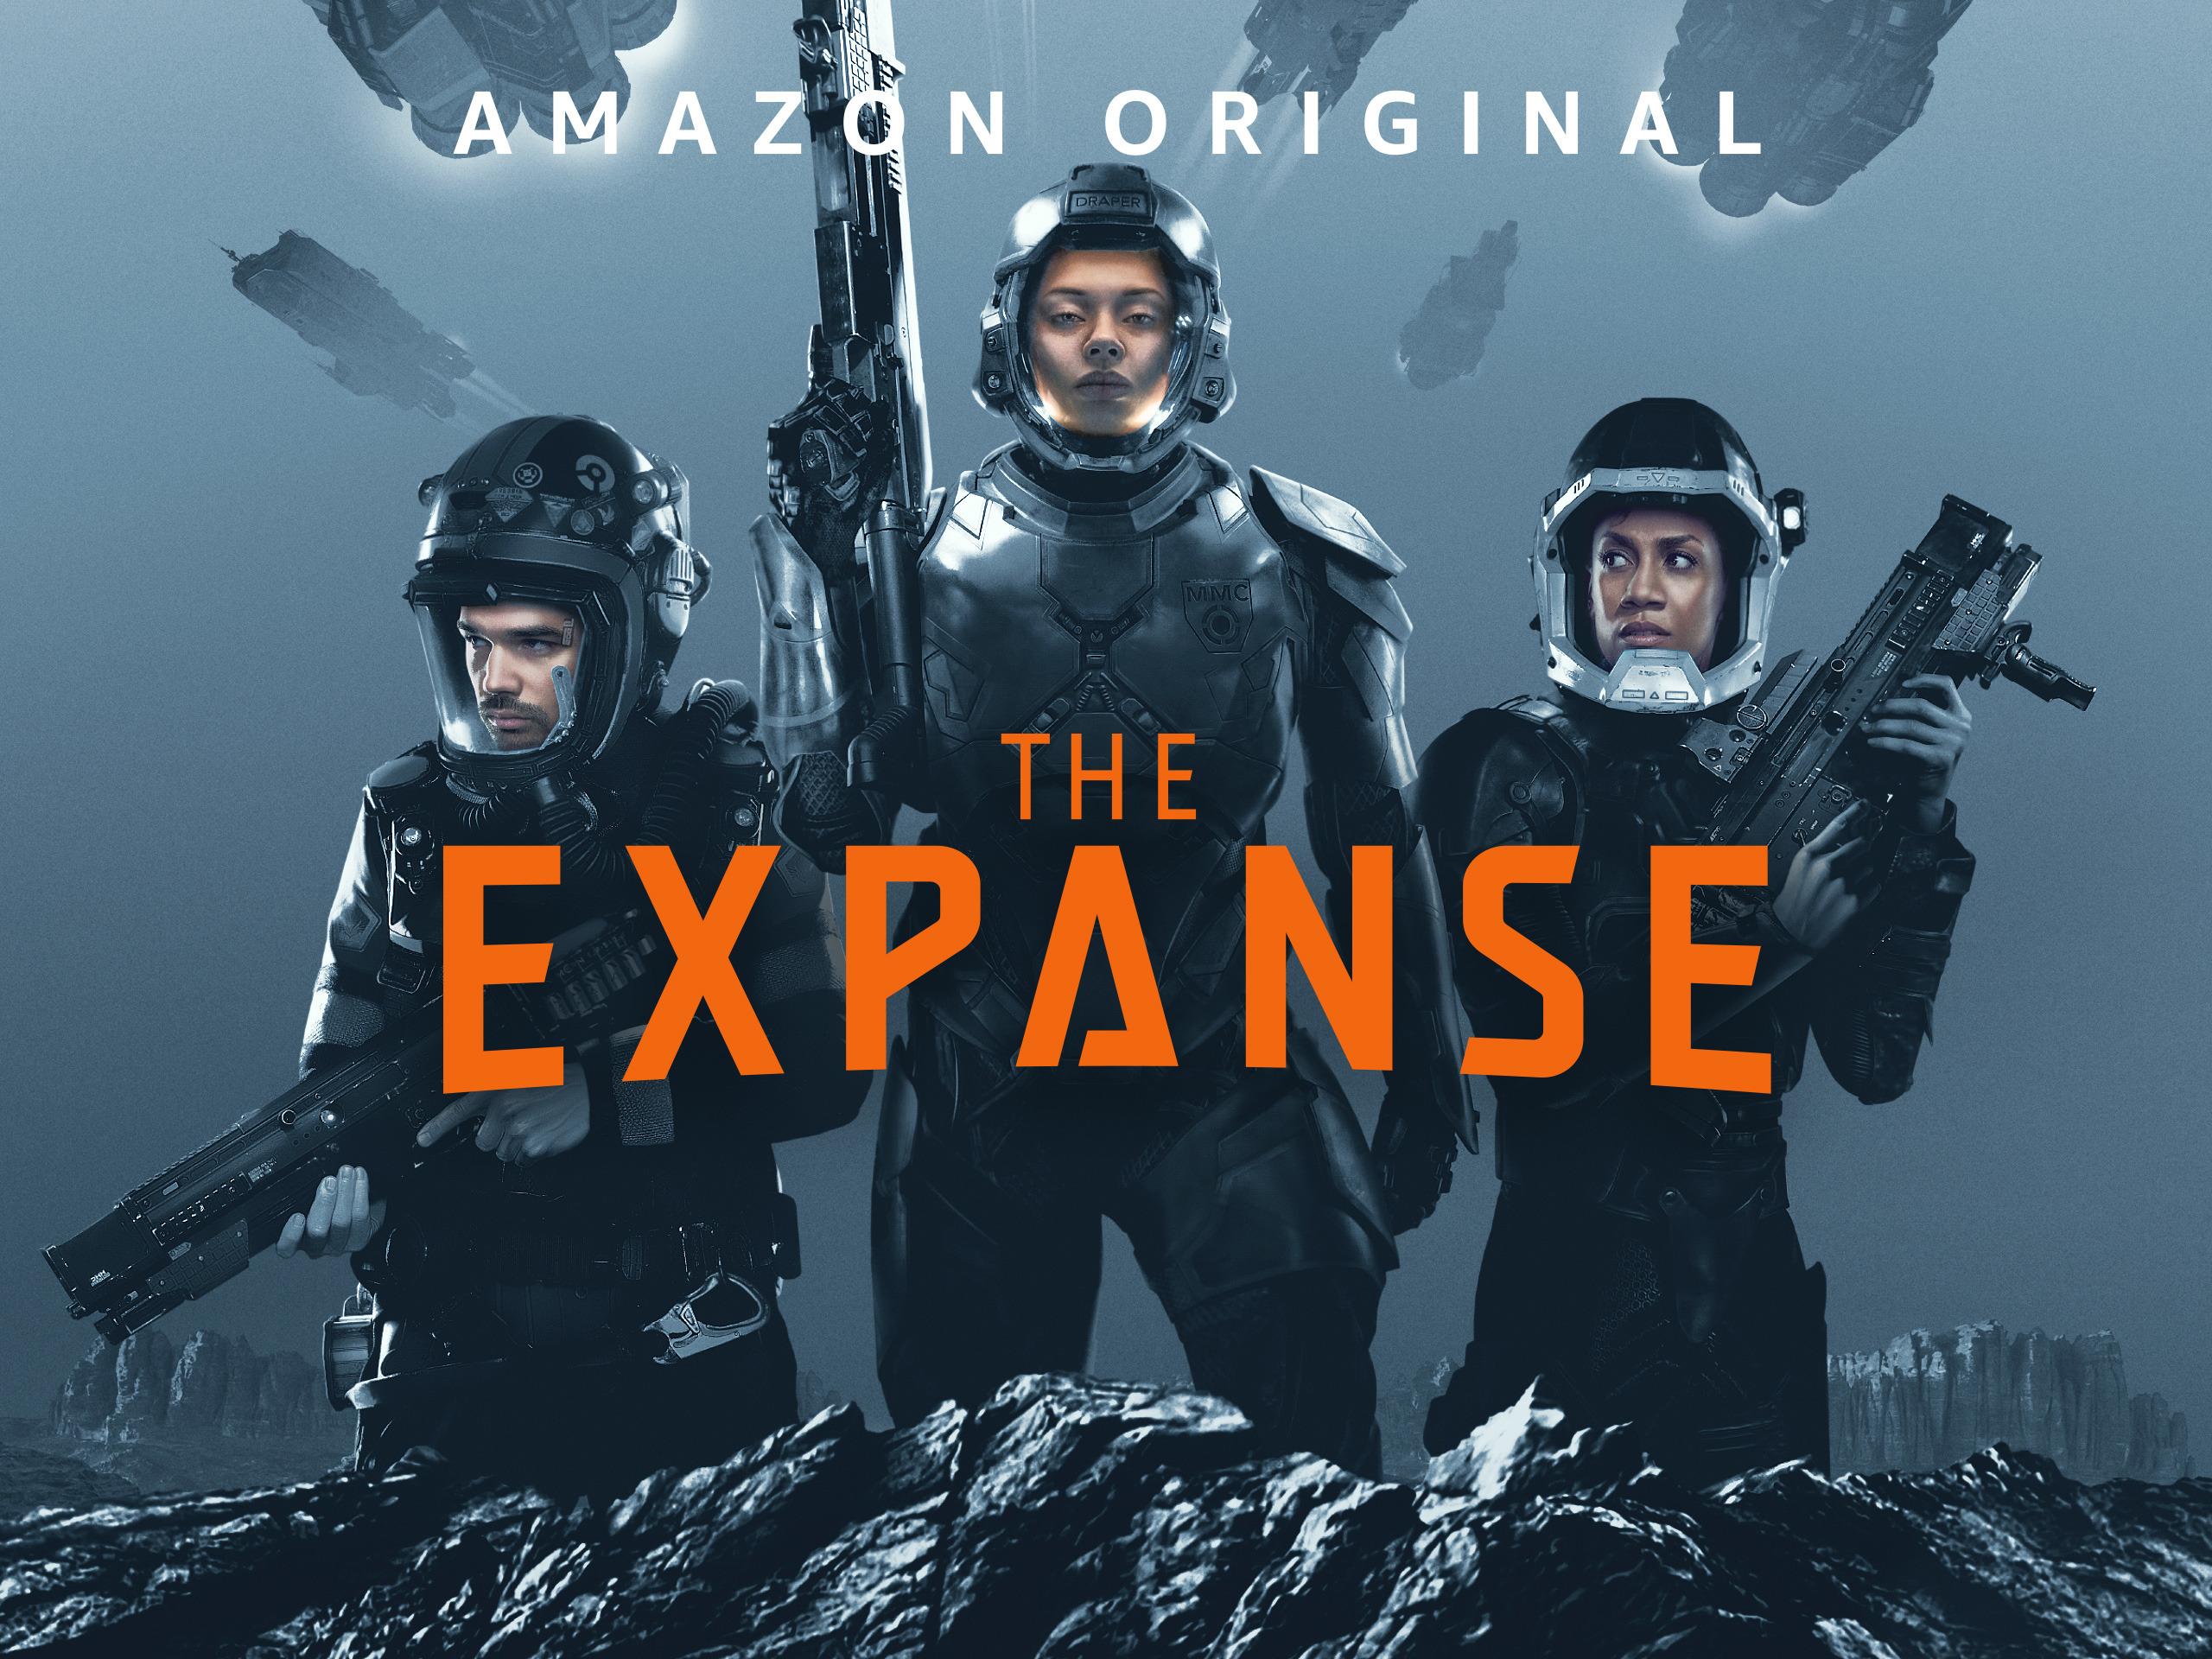 Prime Video: The Expanse - Season 2